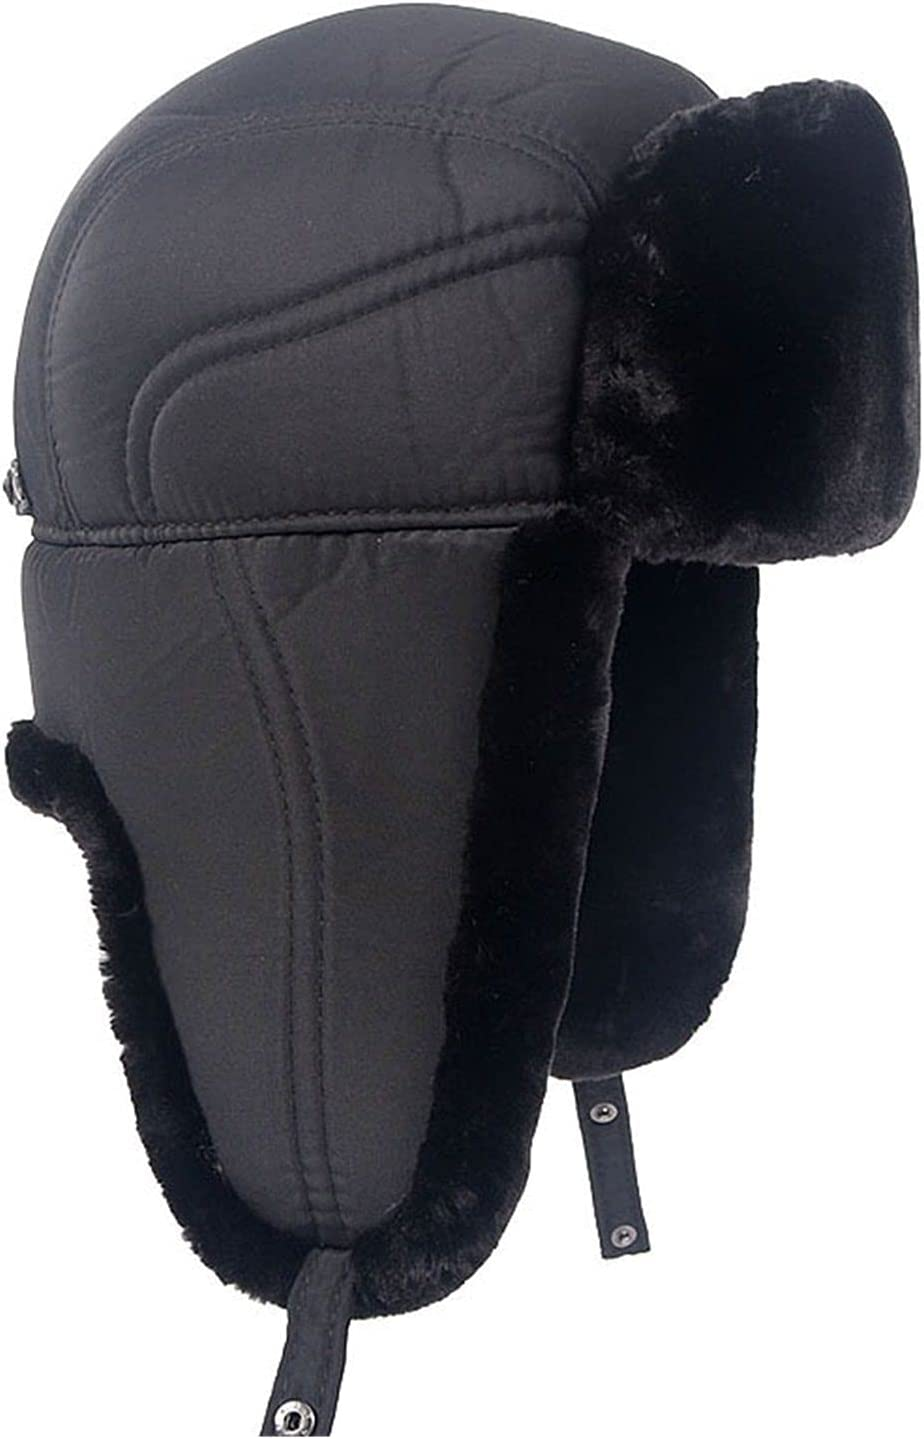 PJRYC Winter Warm Bomber New popularity Hats Black Mens Flaps Ear Under blast sales Dad Snow